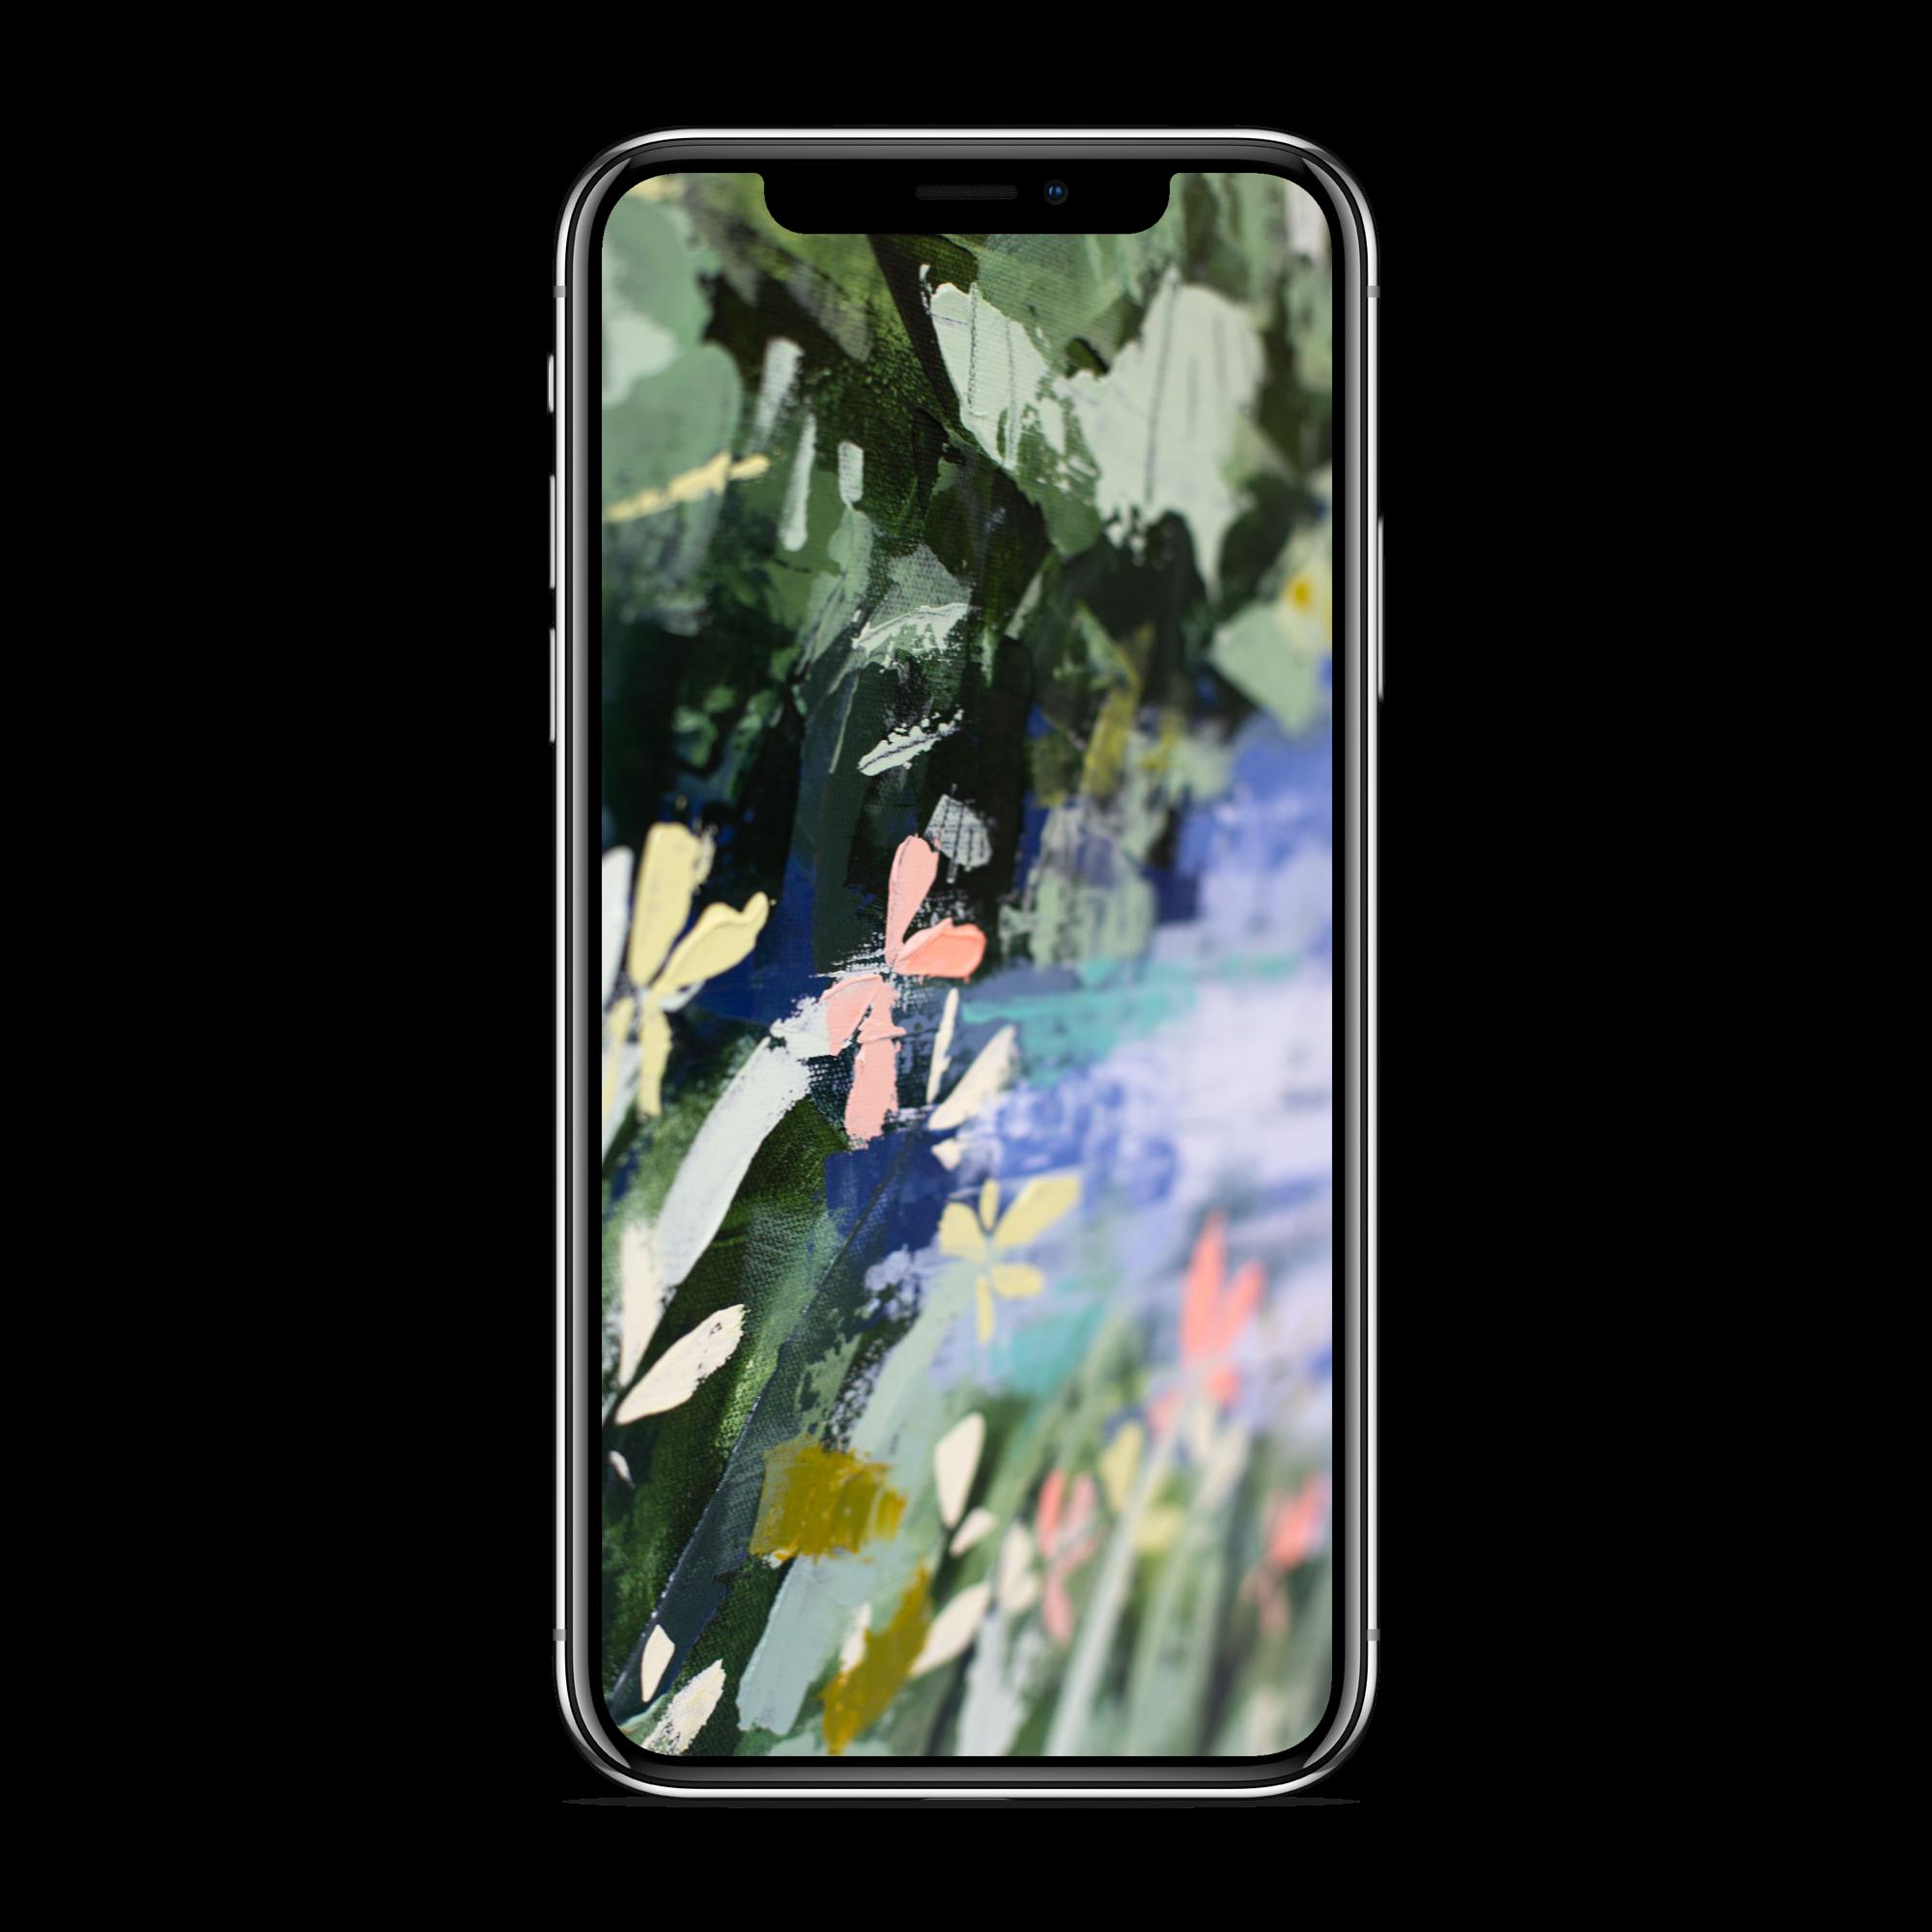 iphonexspacegrey_portrait (1).png